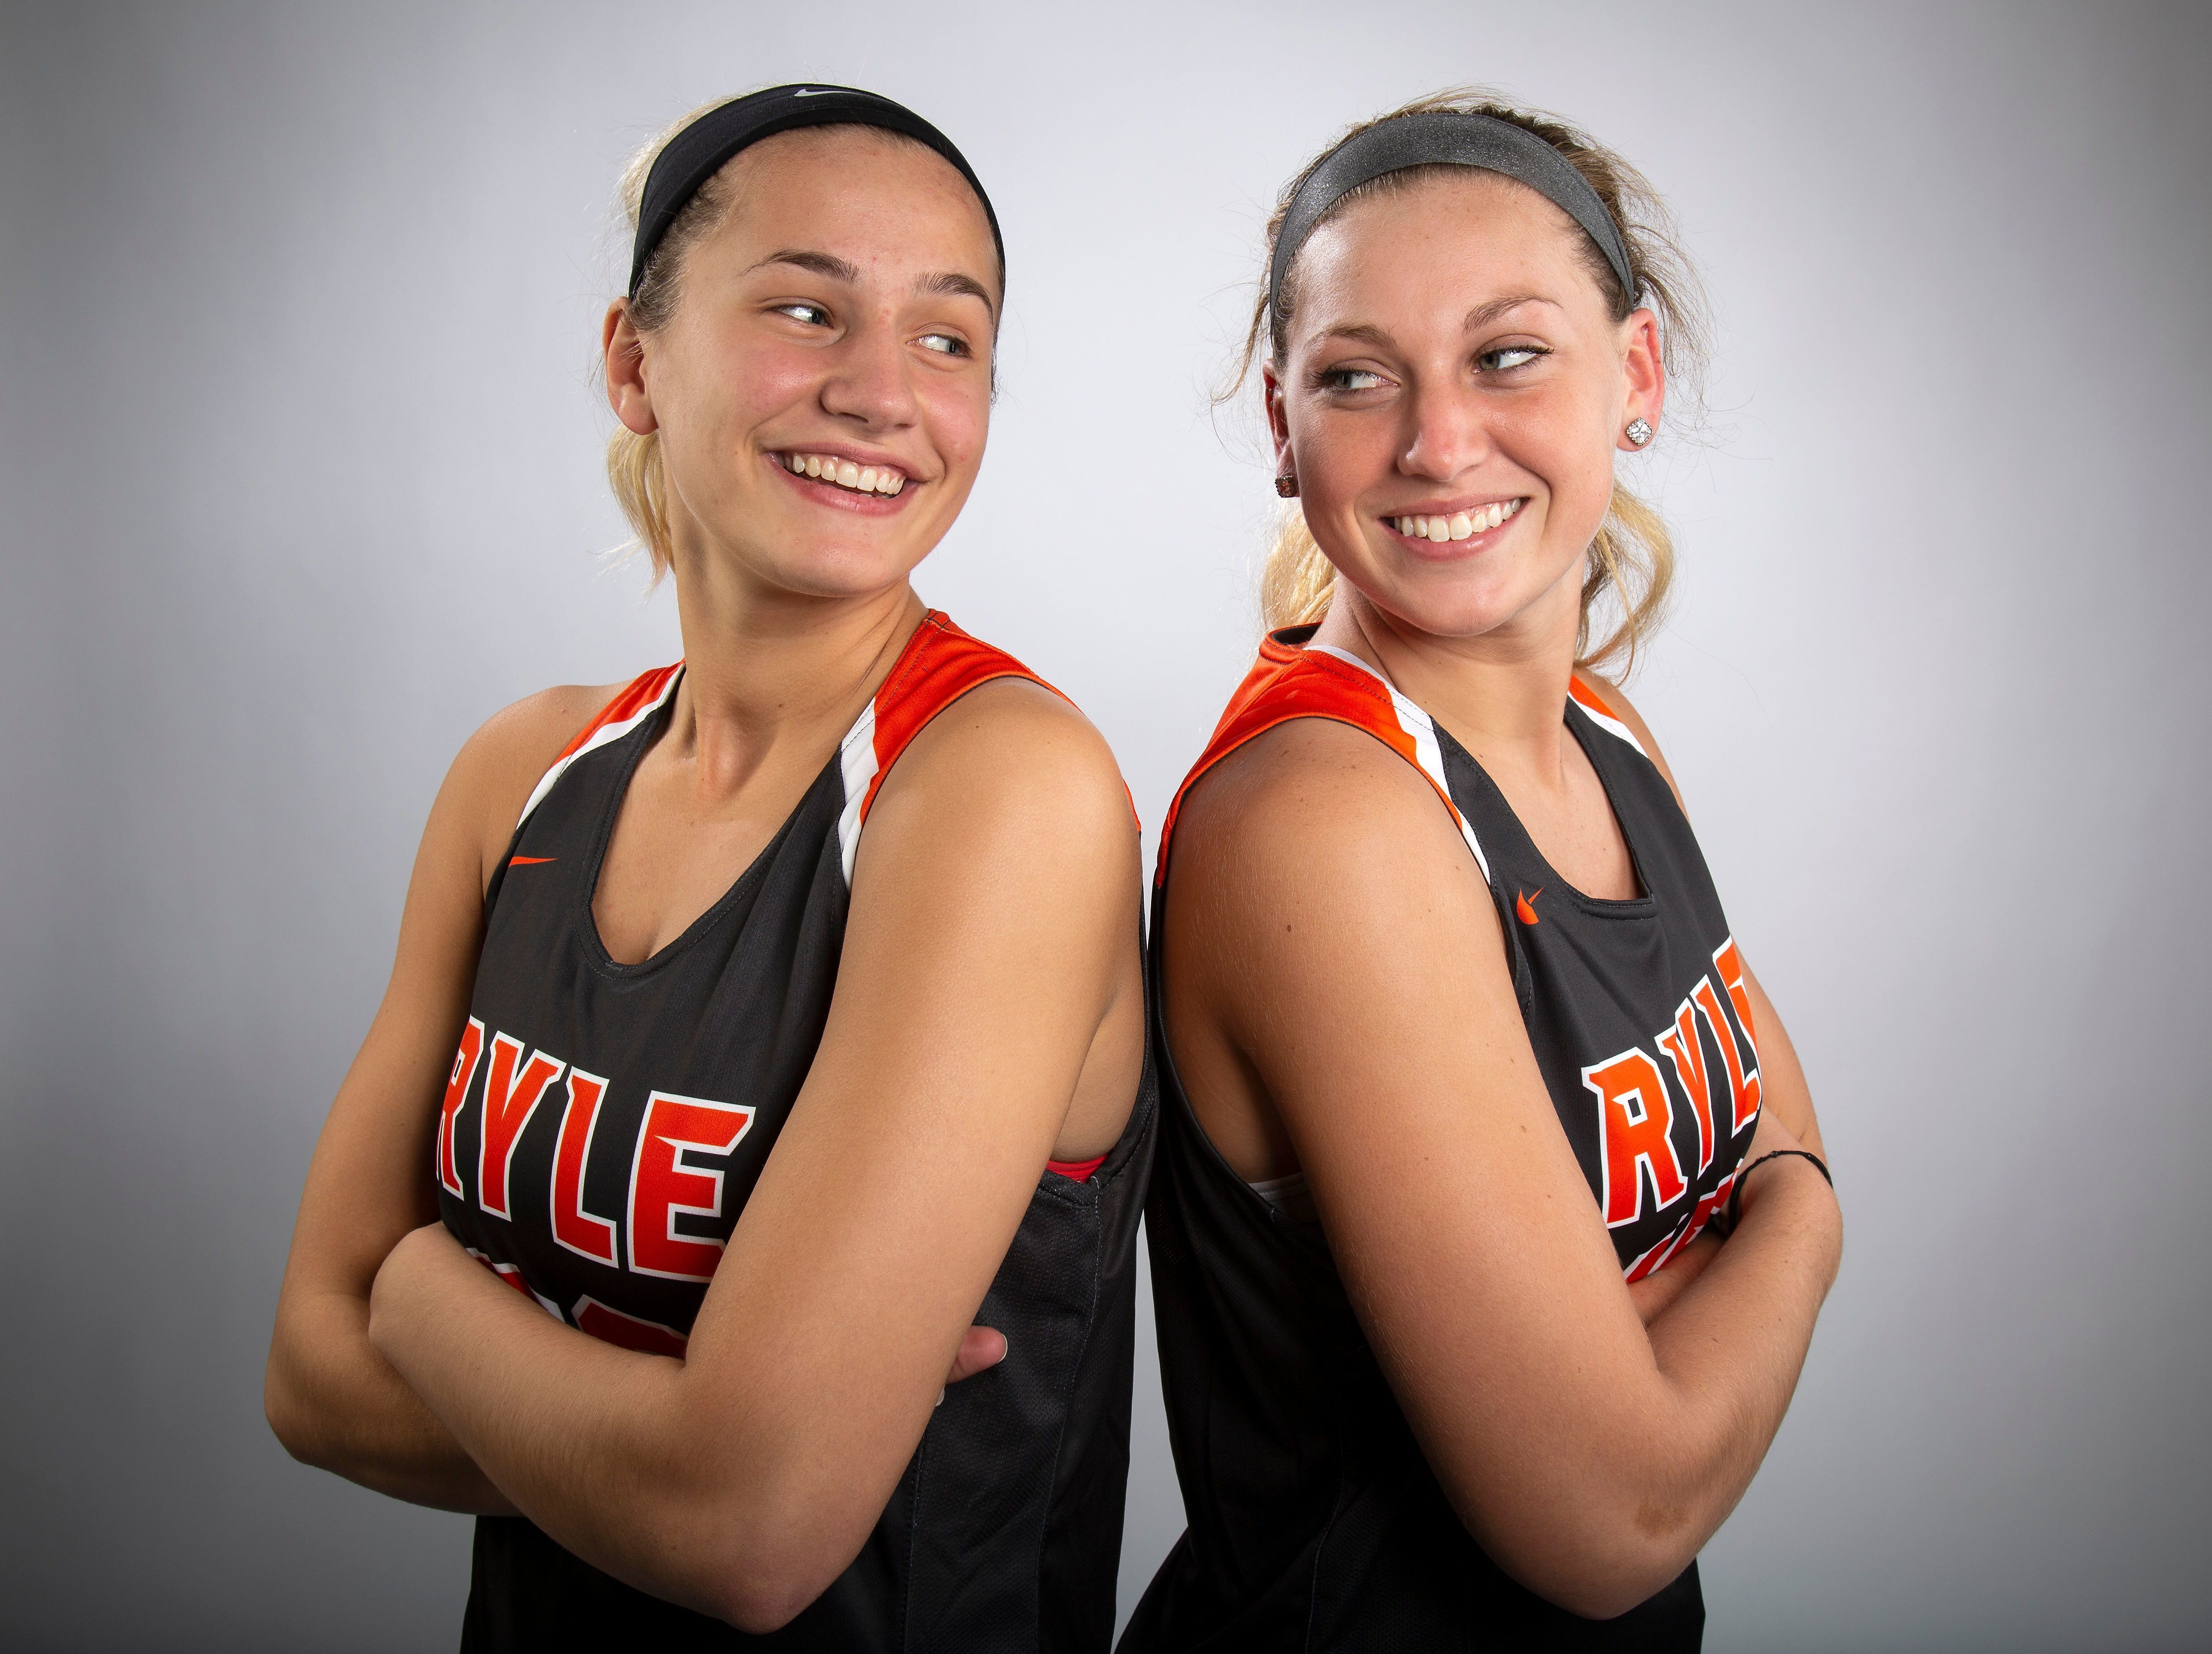 Maddie Scherr (left) and Lauren Schwartz of Ryle High School teamed up to average 34 points and 15 rebounds per game last season.